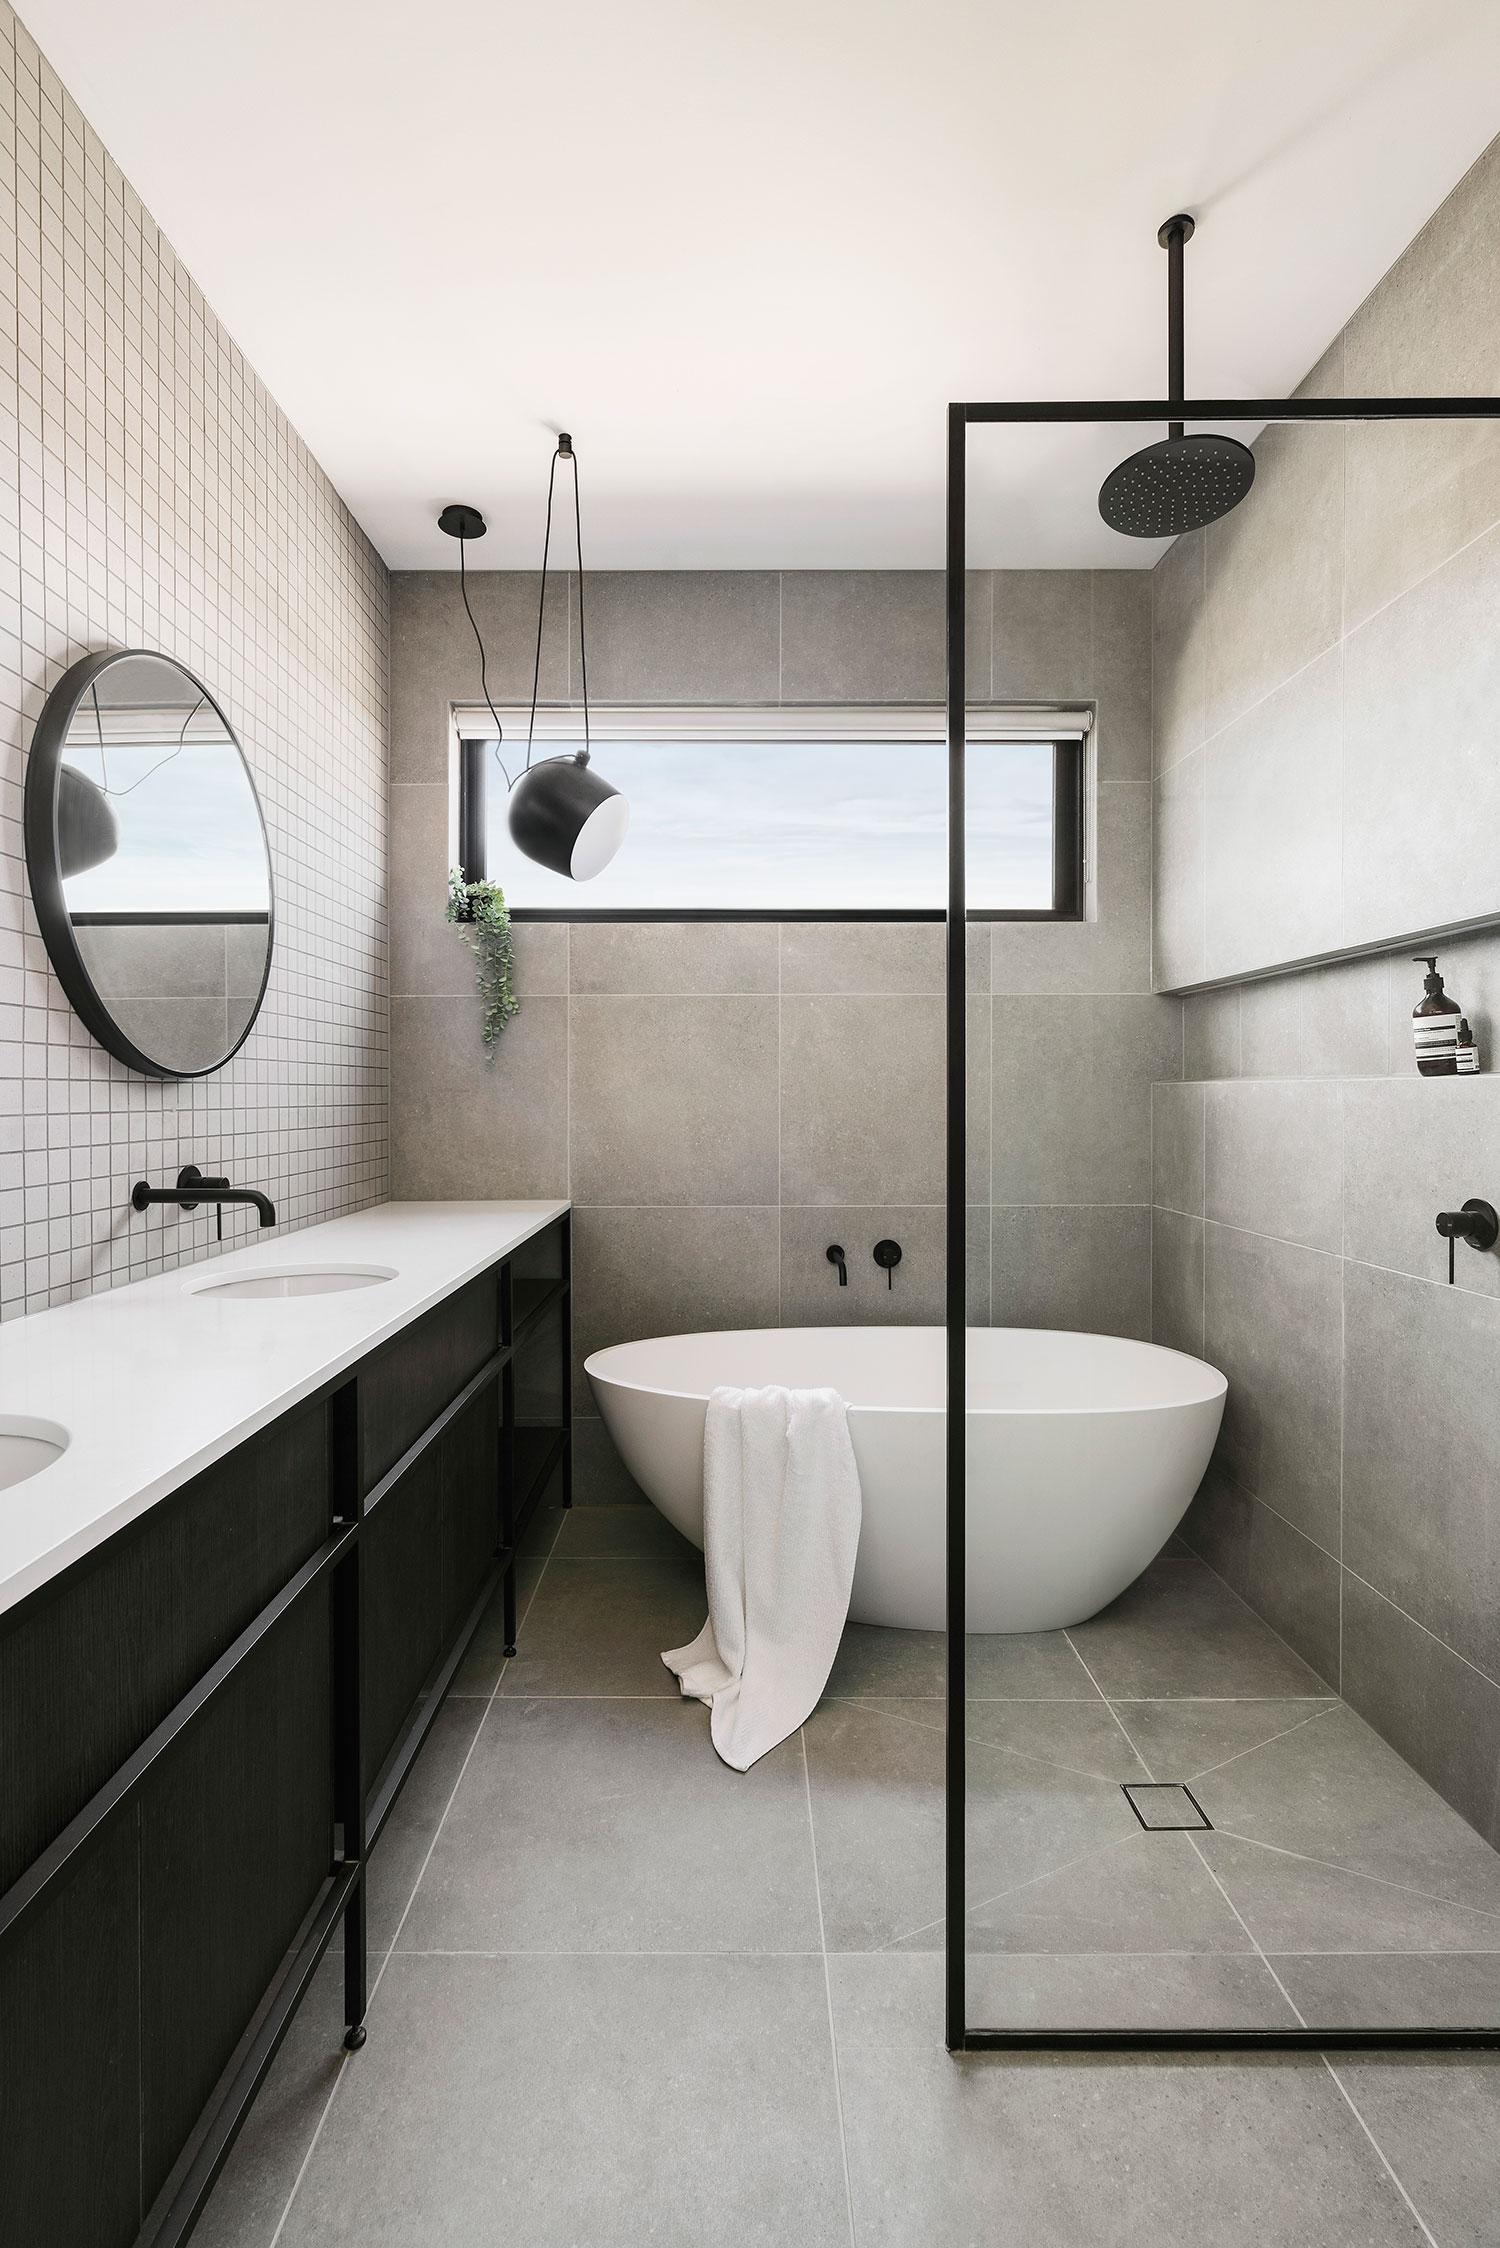 osborne-townhouse-interior-design-bathroom-ckariouz-architects2